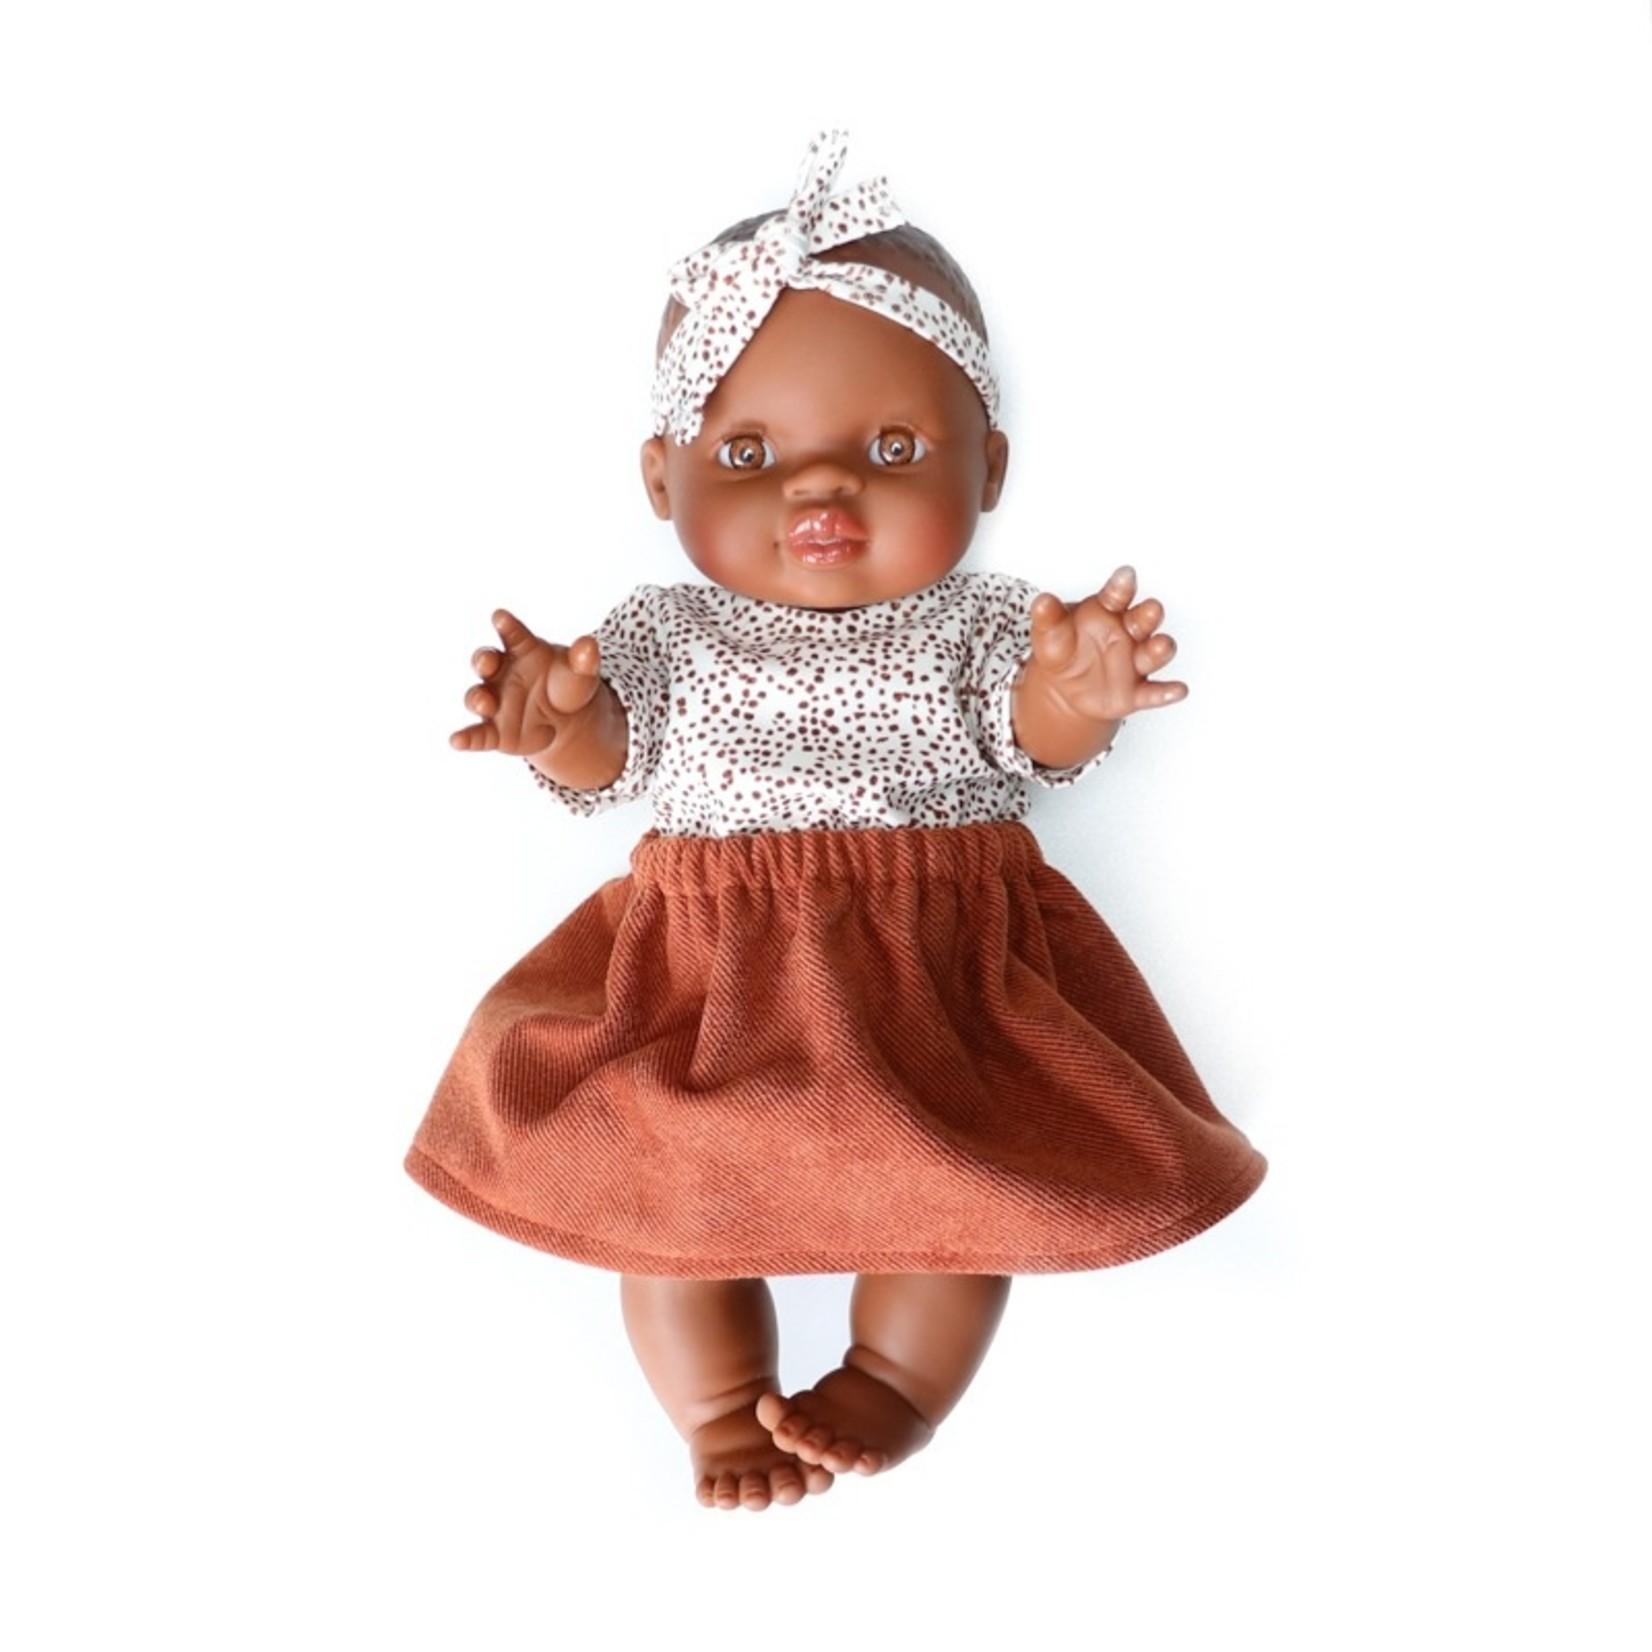 Gordi Babypop Meisje met blauwe ogen